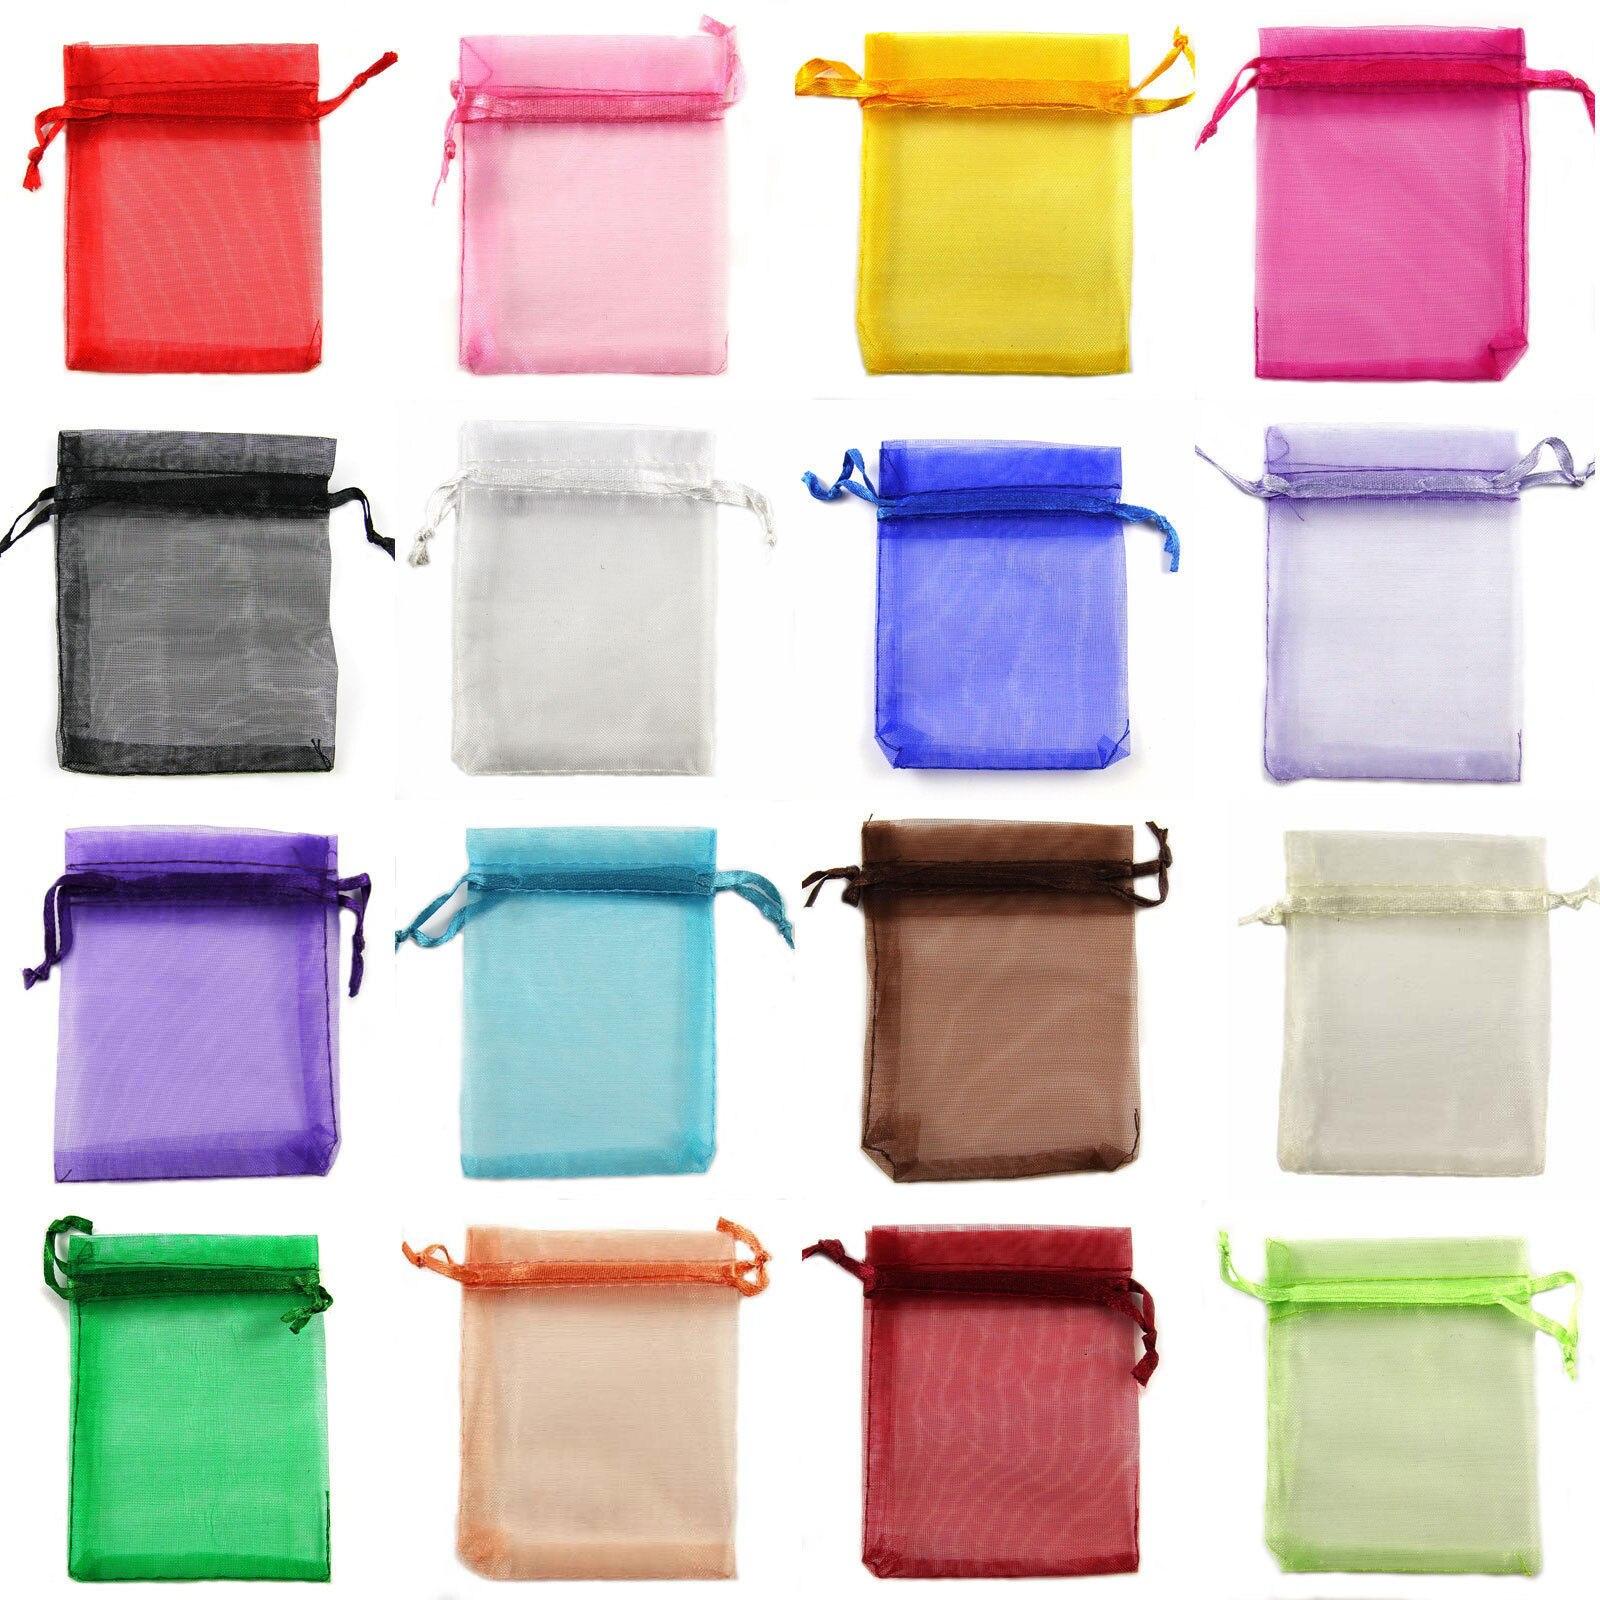 Sheer Wedding Favor Bags Bulk : Organza Bags Bulk-Buy Cheap Organza Bags Bulk lots from China Organza ...